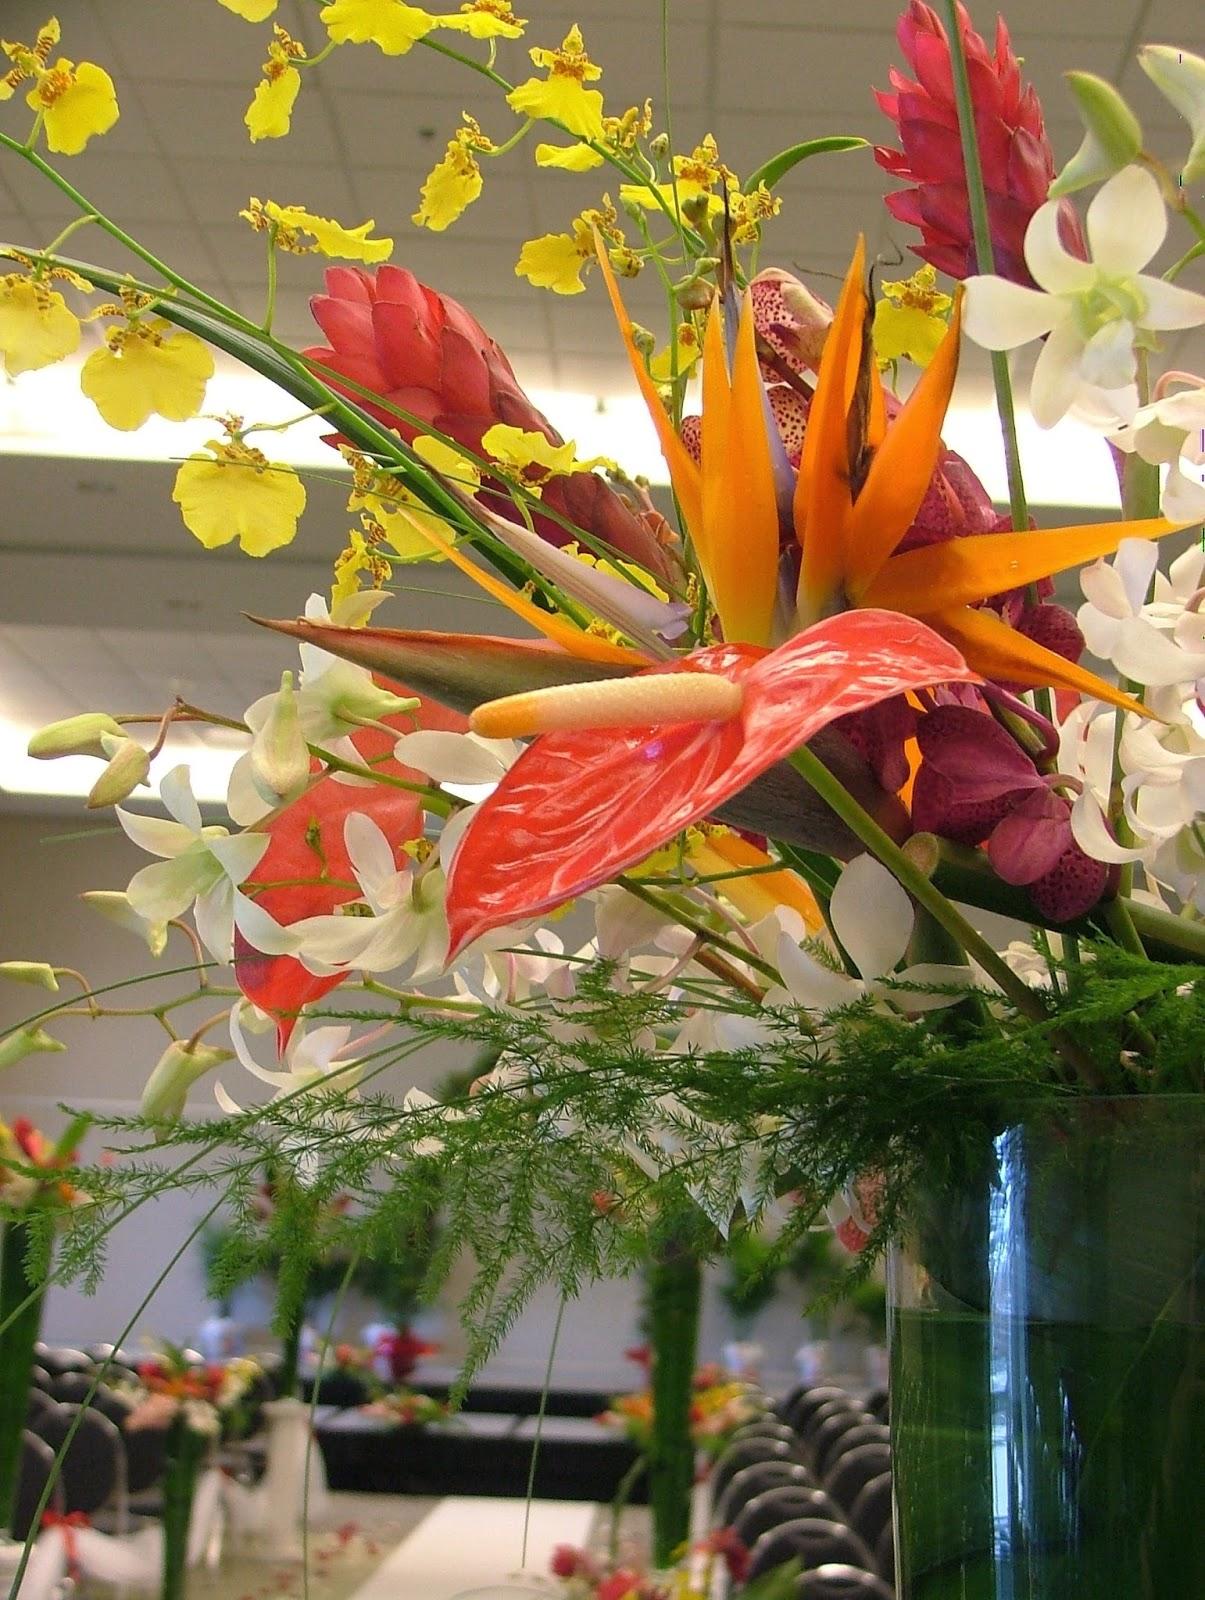 Quality silk plants blog add a splash of color to your room with add a splash of color to your room with silk flowers mightylinksfo